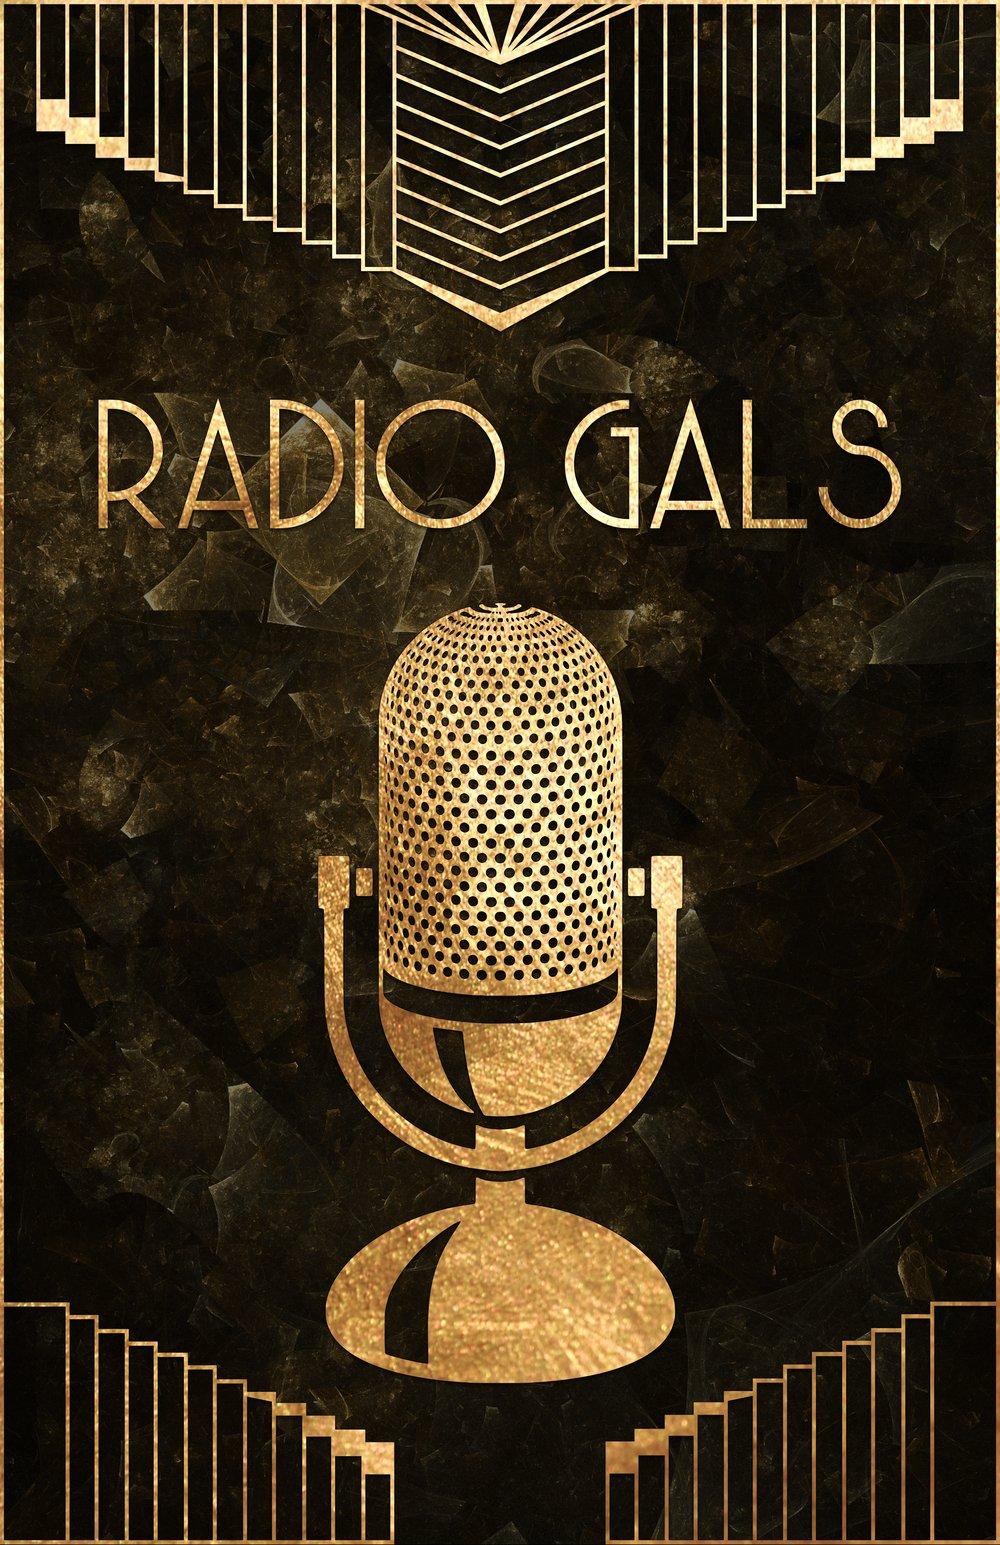 Radio Gals Art.jpeg